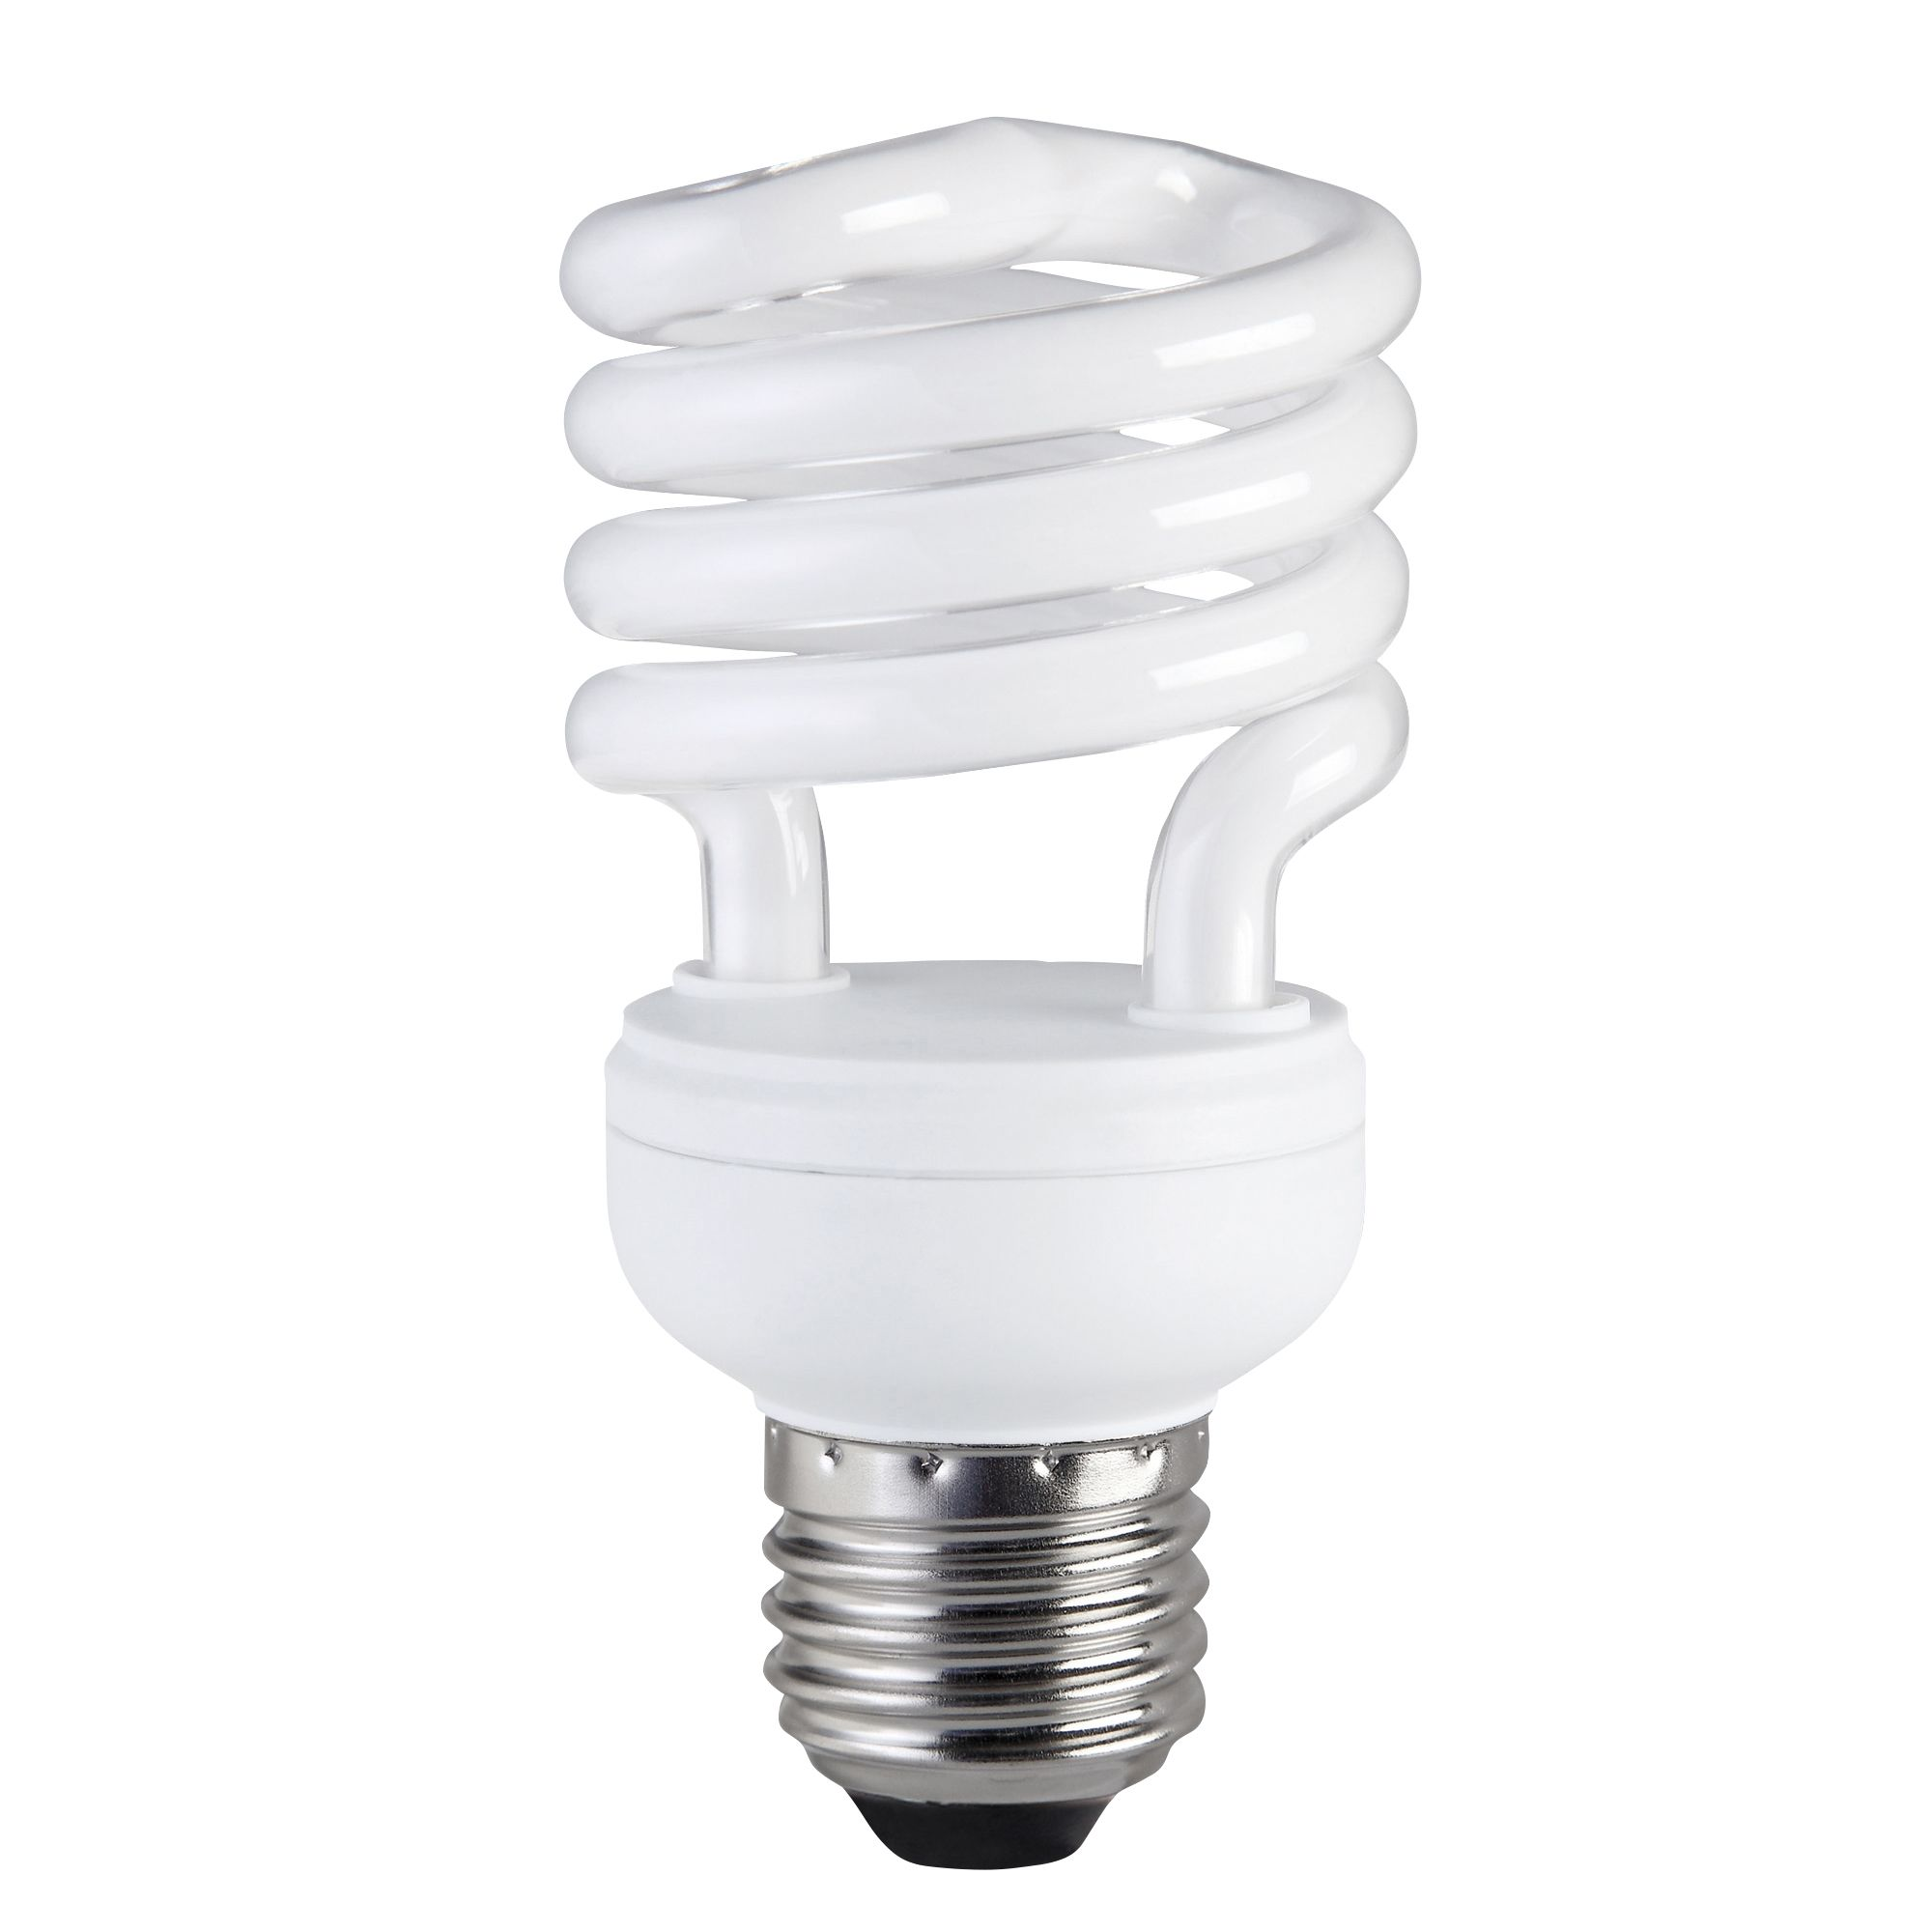 Diall E27 15W CFL Spiral Light Bulb | Departments | DIY at B for Smart Bulb - Energy Efficient Light Bulbs PNG